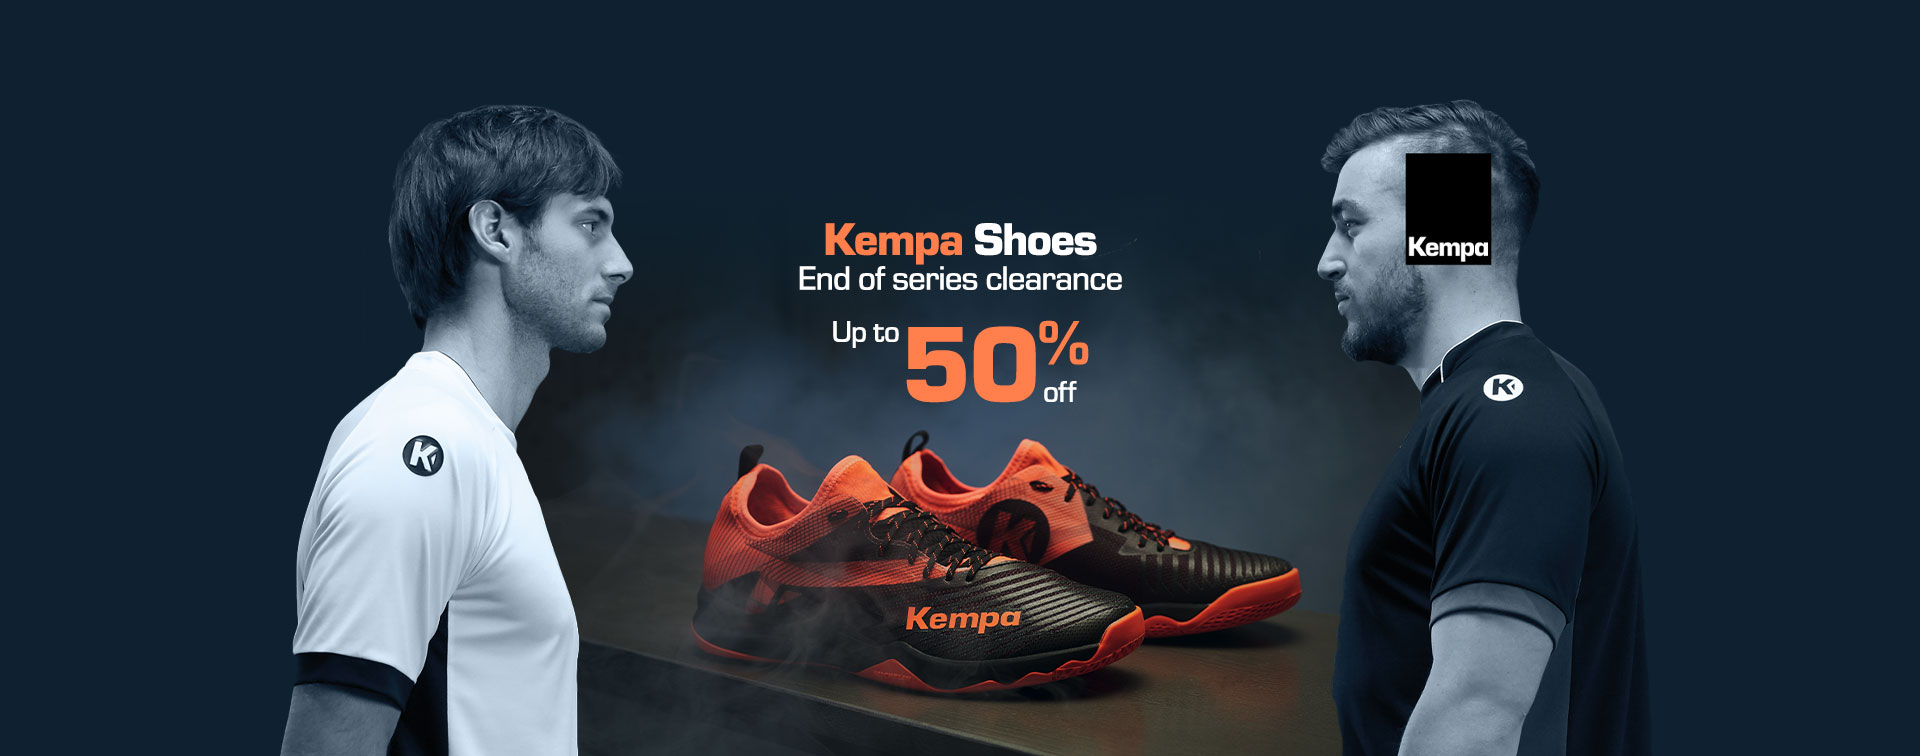 kempa shoes clearance